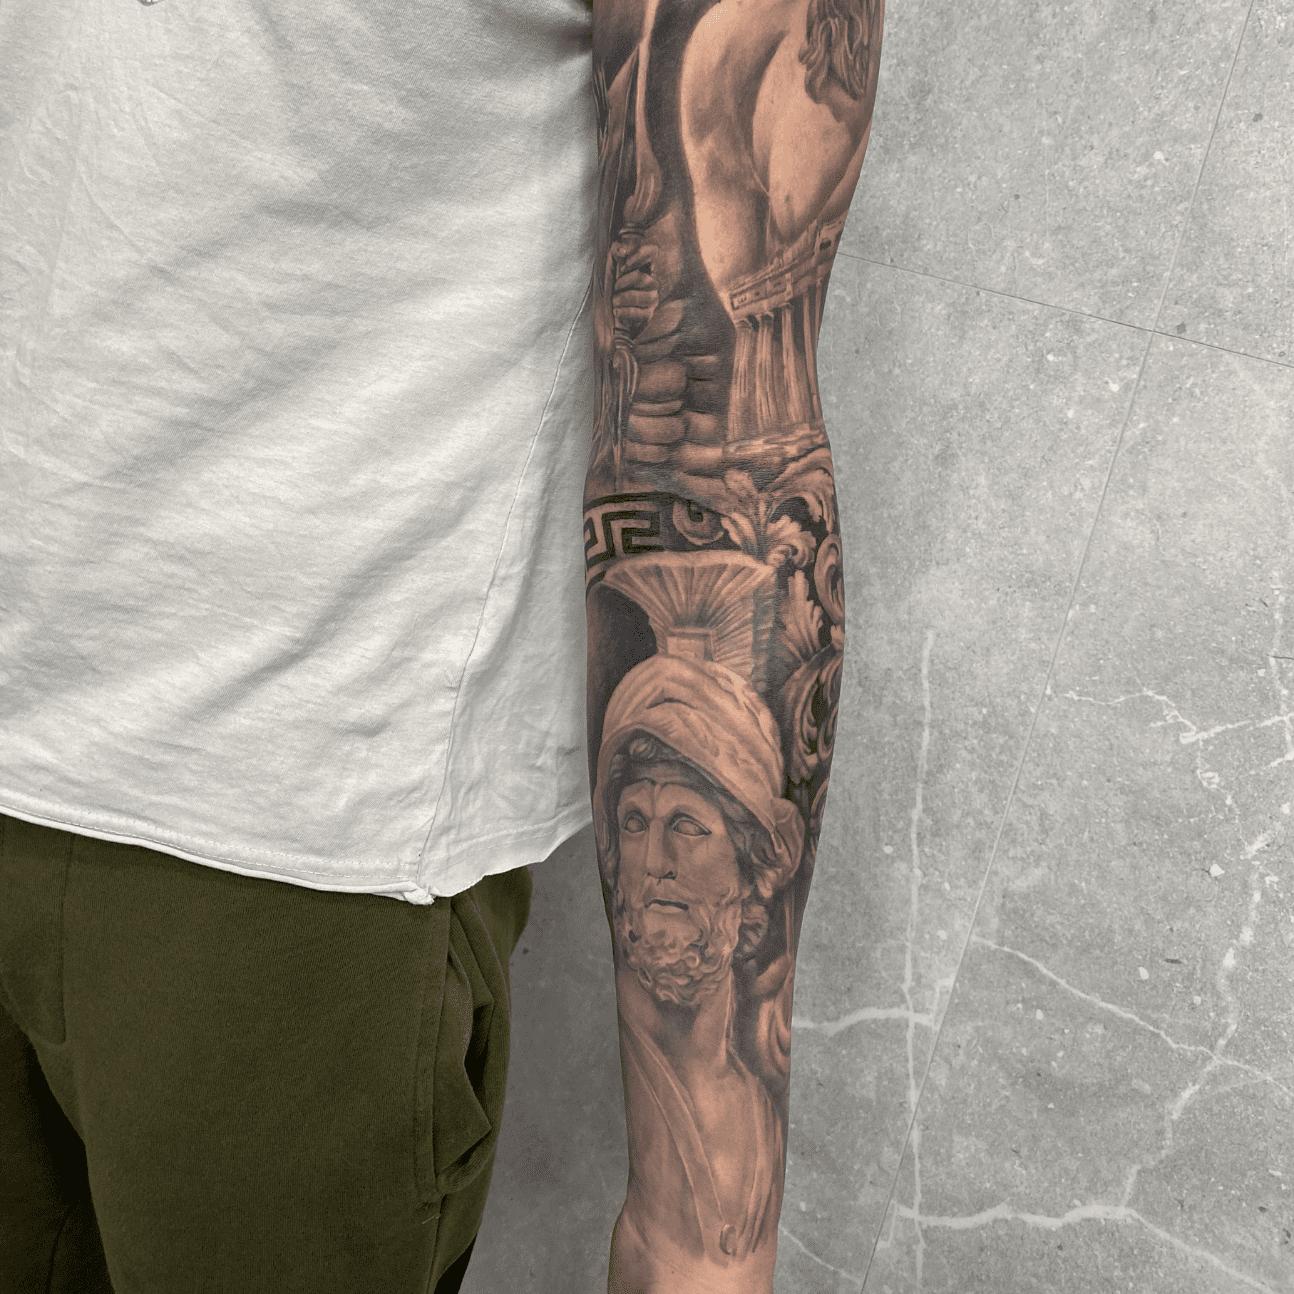 braccio-realistico-tattoo-black-and-grey-alt